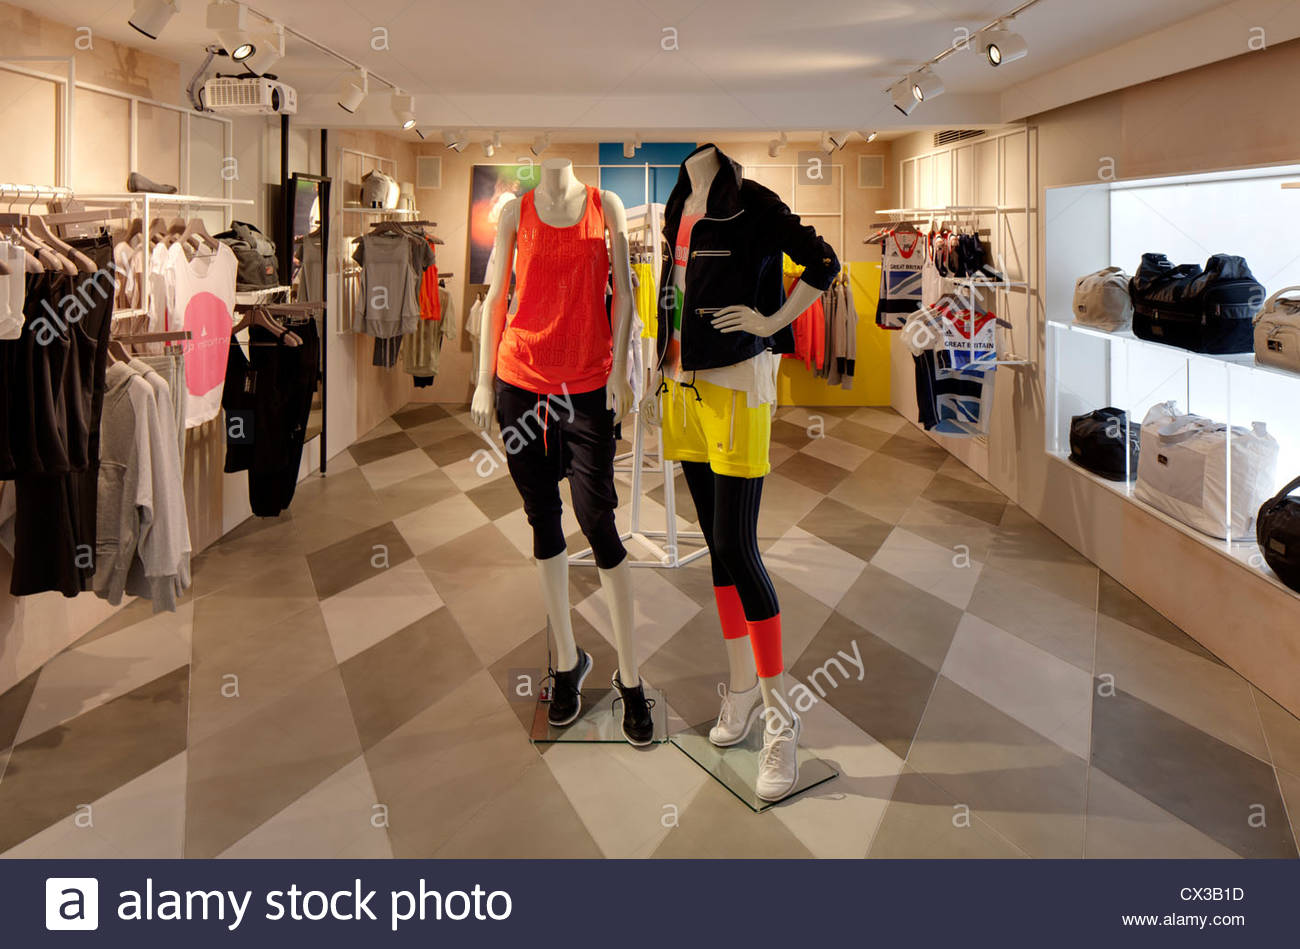 Adidas Store London Stock Photos & Adidas Store London Stock Images ...